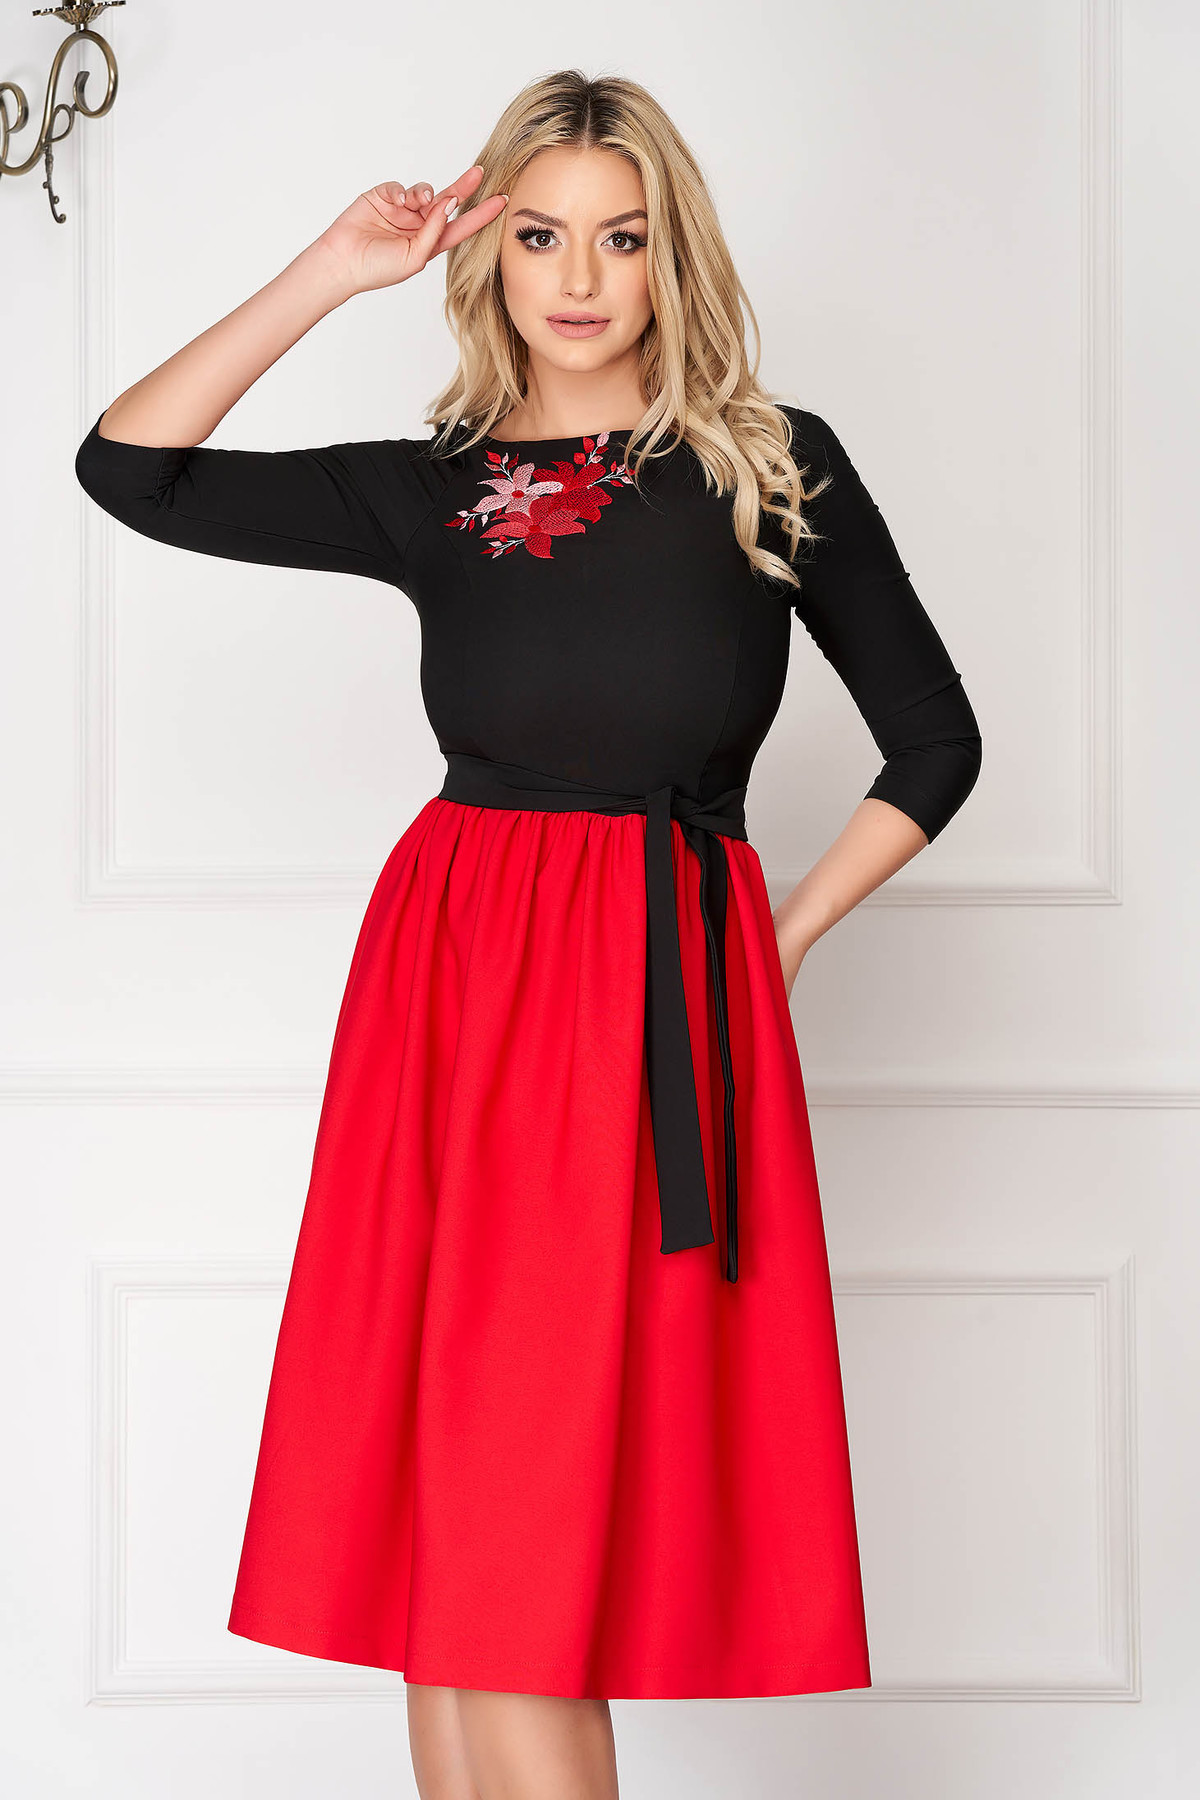 Rochie StarShinerS rosie midi de ocazie in clos din stofa cu maneci trei-sferturi si broderie florala